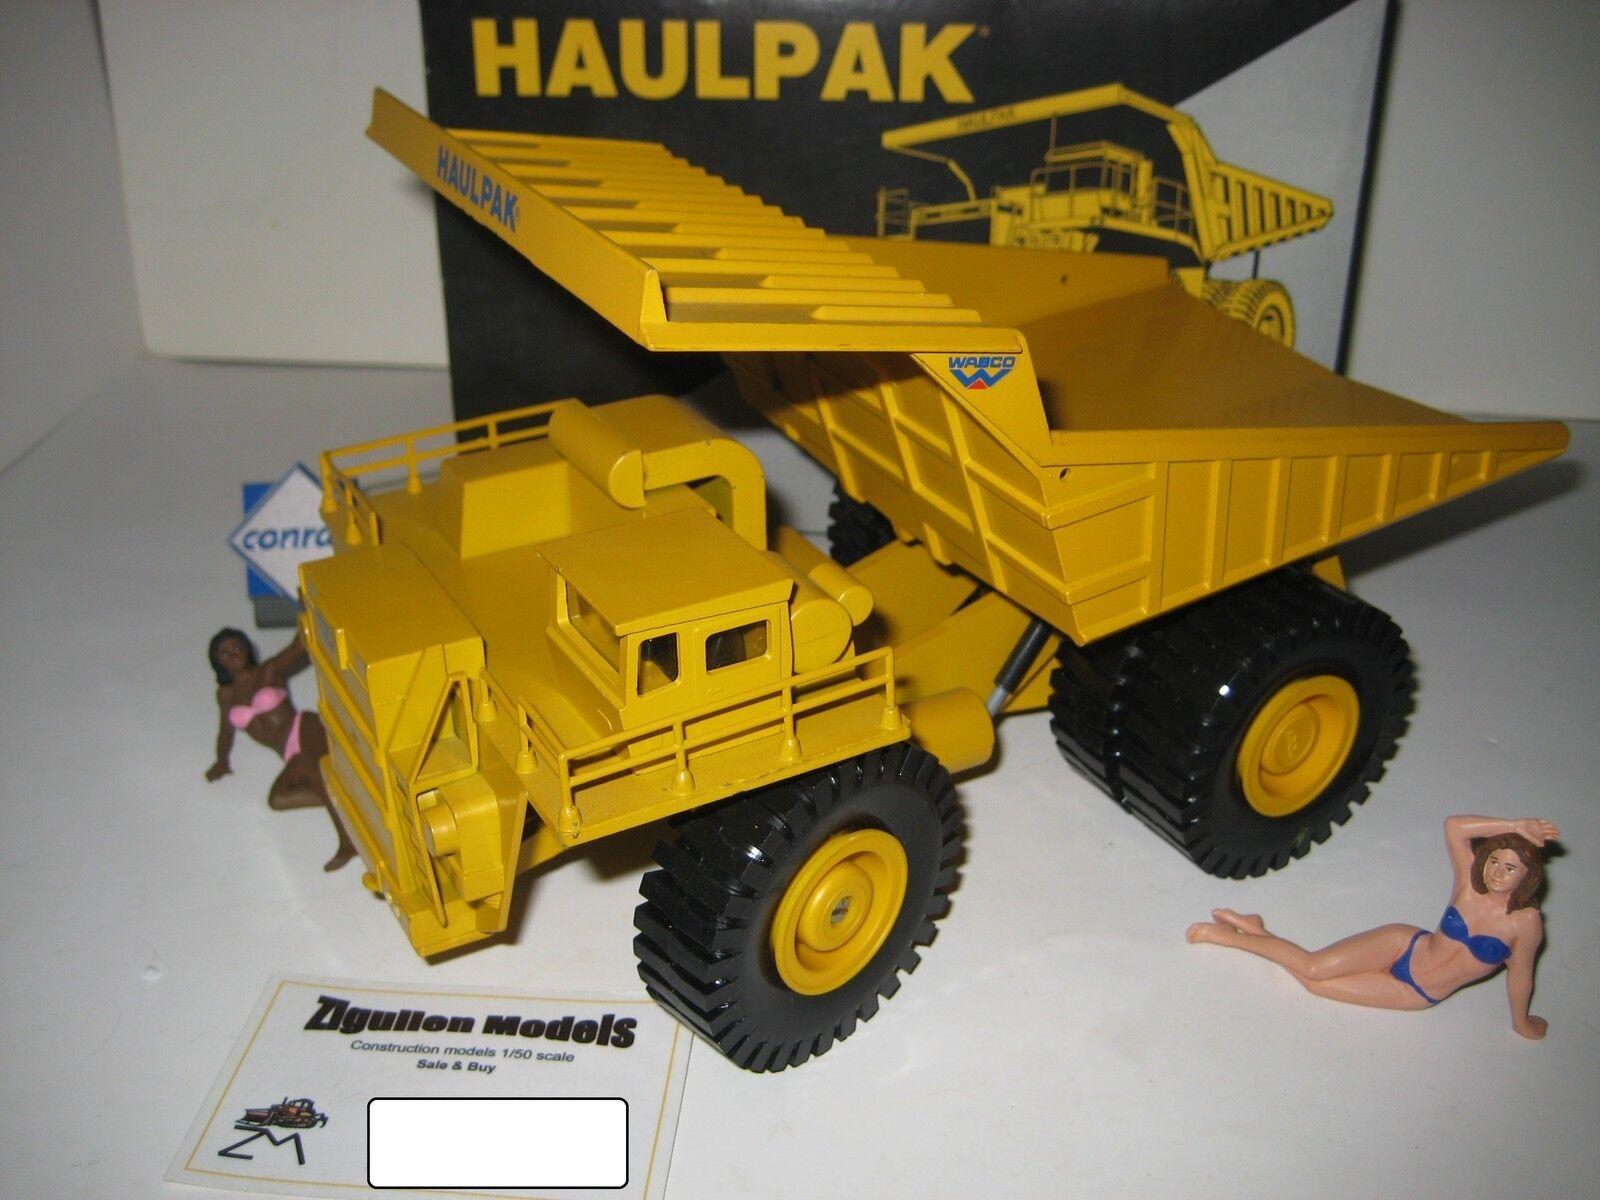 Wabco HAULPAK dumper yellow  2720.2 conrad 1 50 ovp